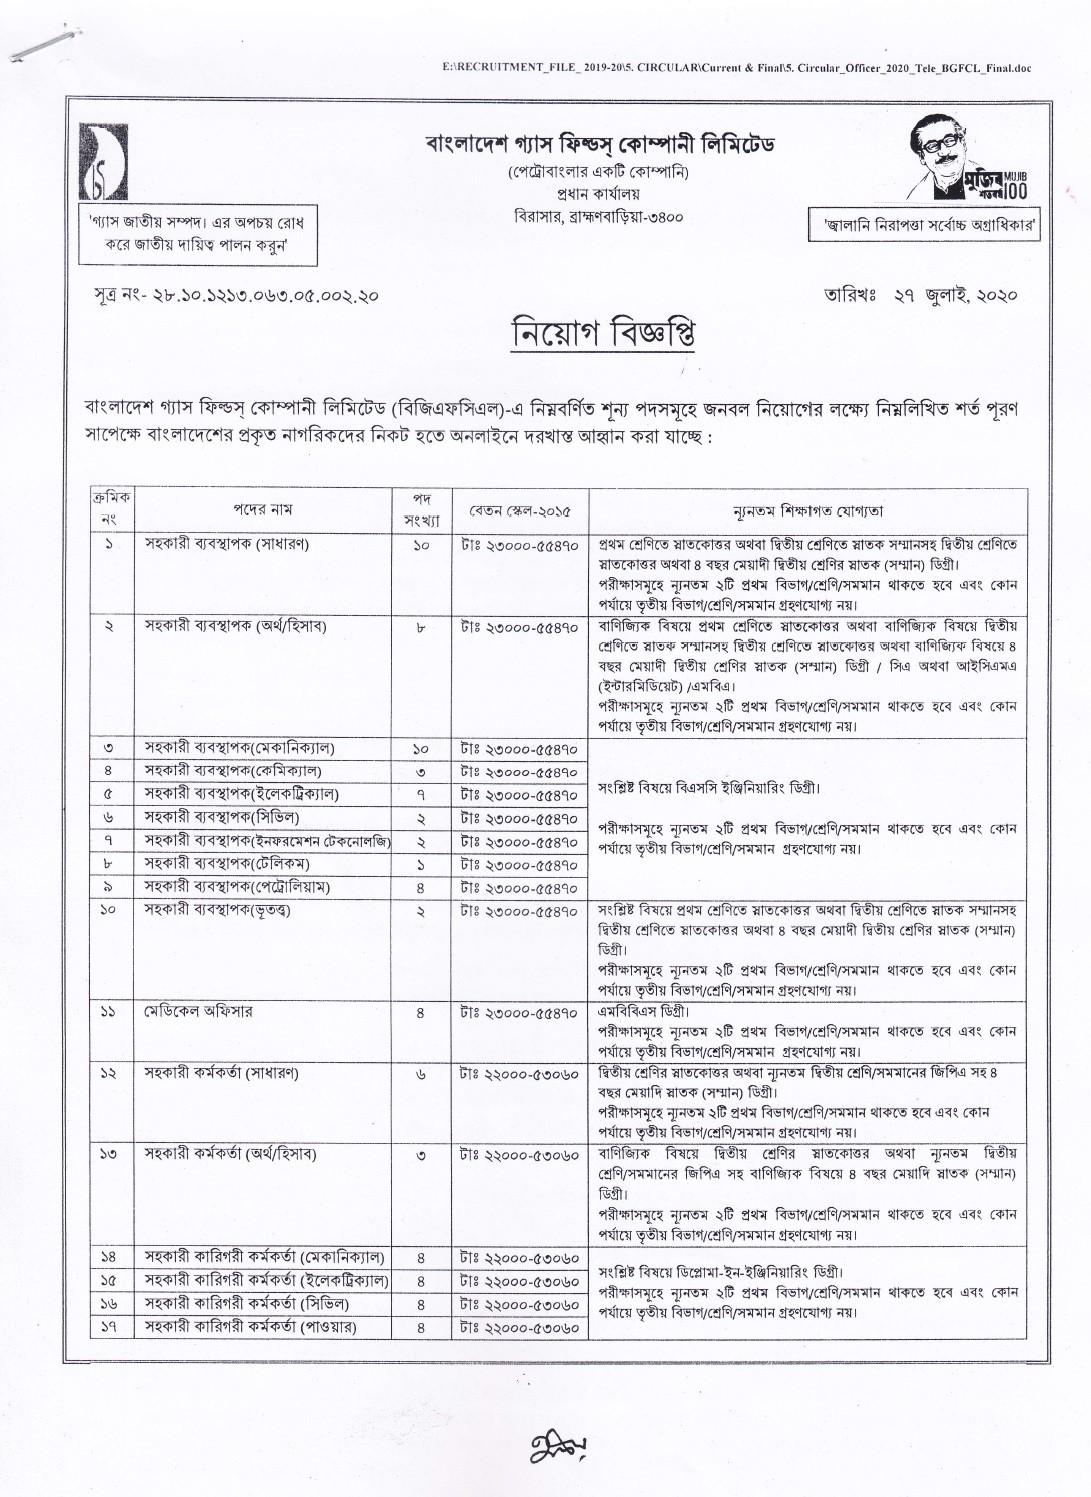 Bangladesh Gas Fields Company Job Circular 2020